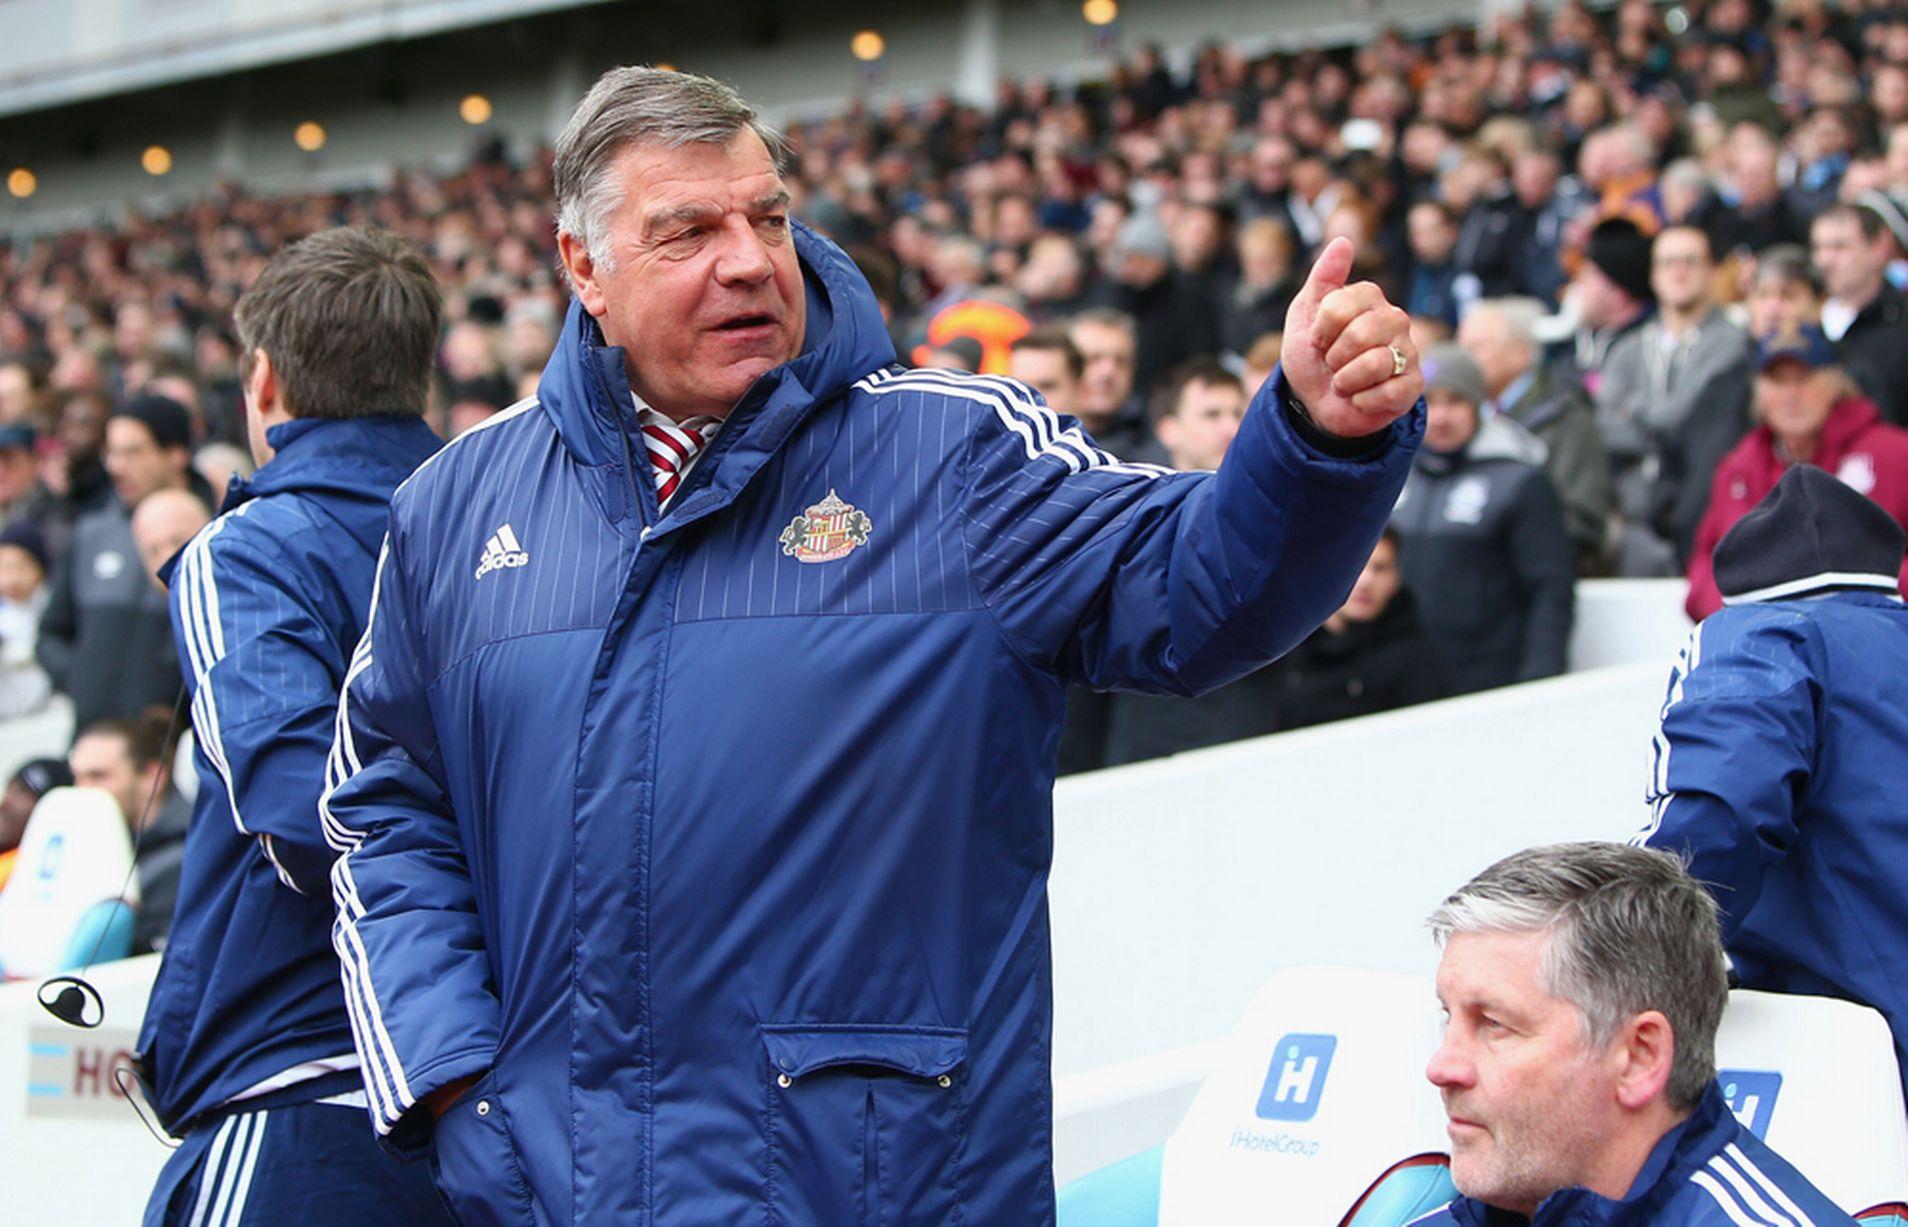 West-Ham-v-Sunderland (3)